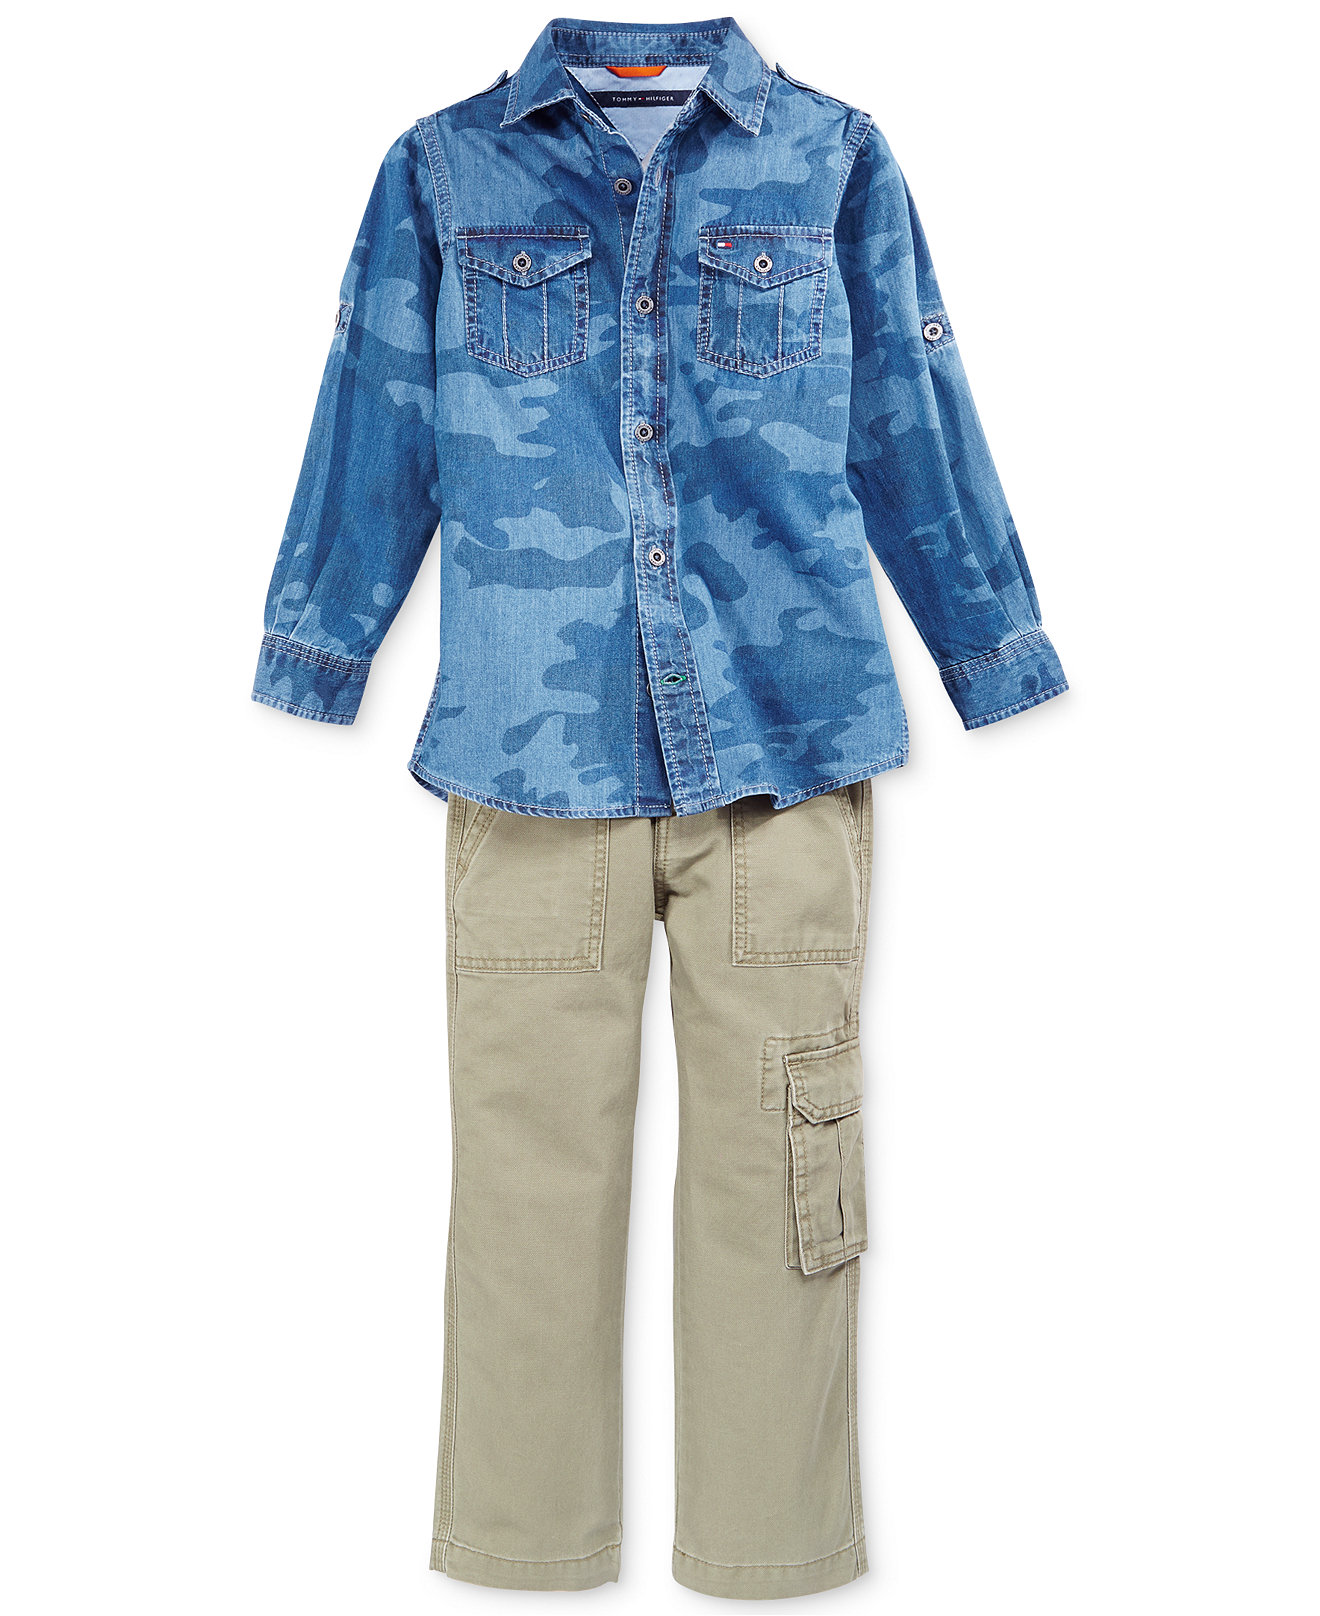 Рубашка детская Tommy hilfiger  2015 ML футболка детская tommy hilfiger 2015 polo ml